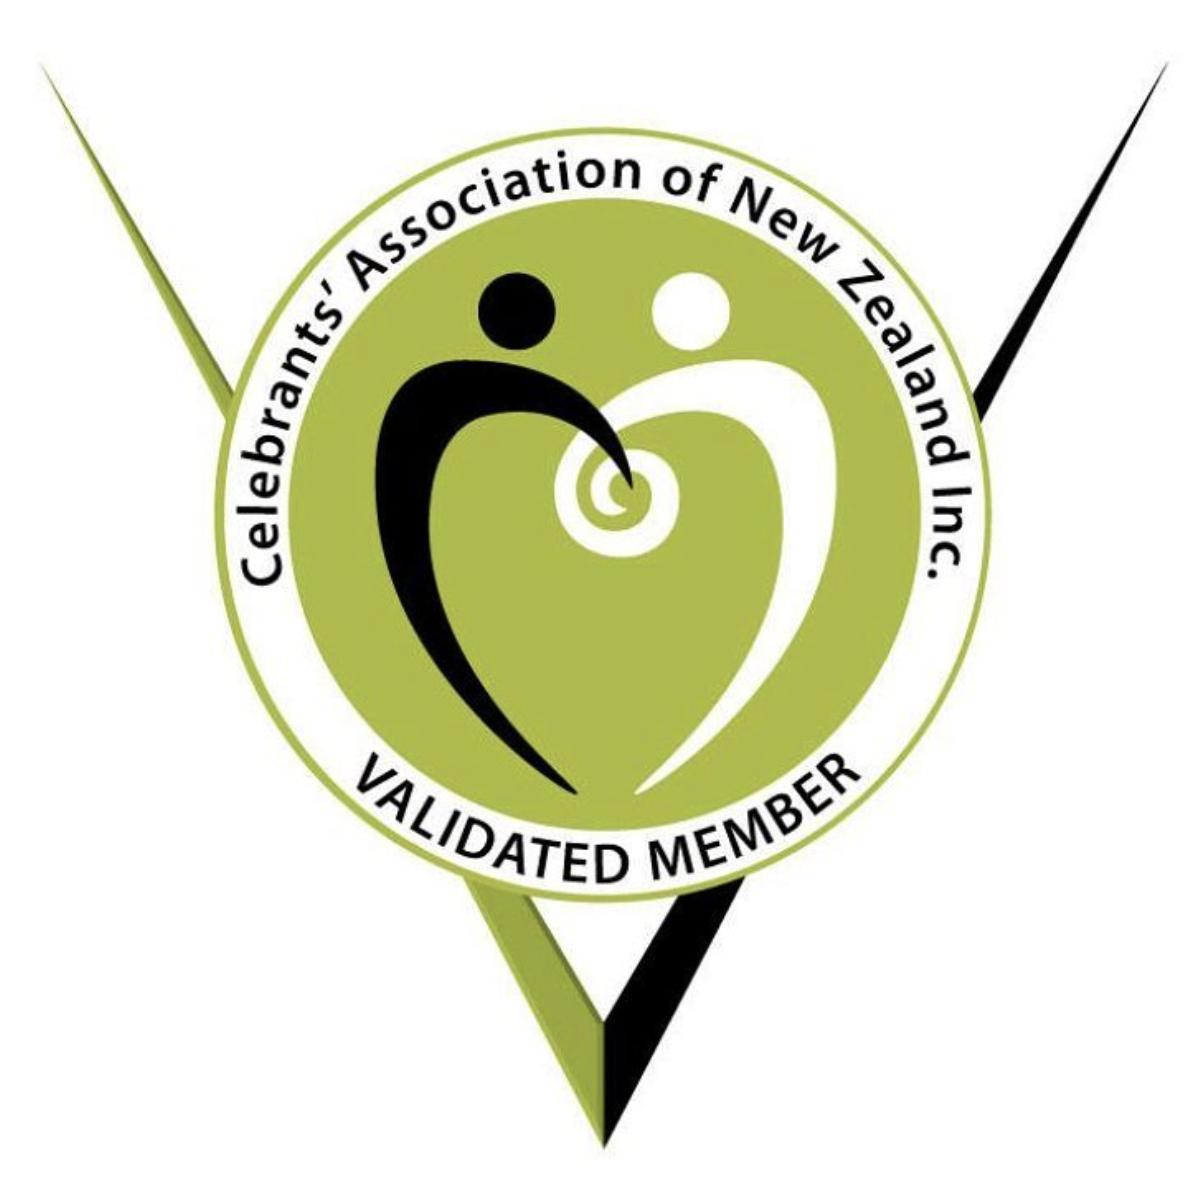 Larry Summerville - Celebrants Association of New Zealand